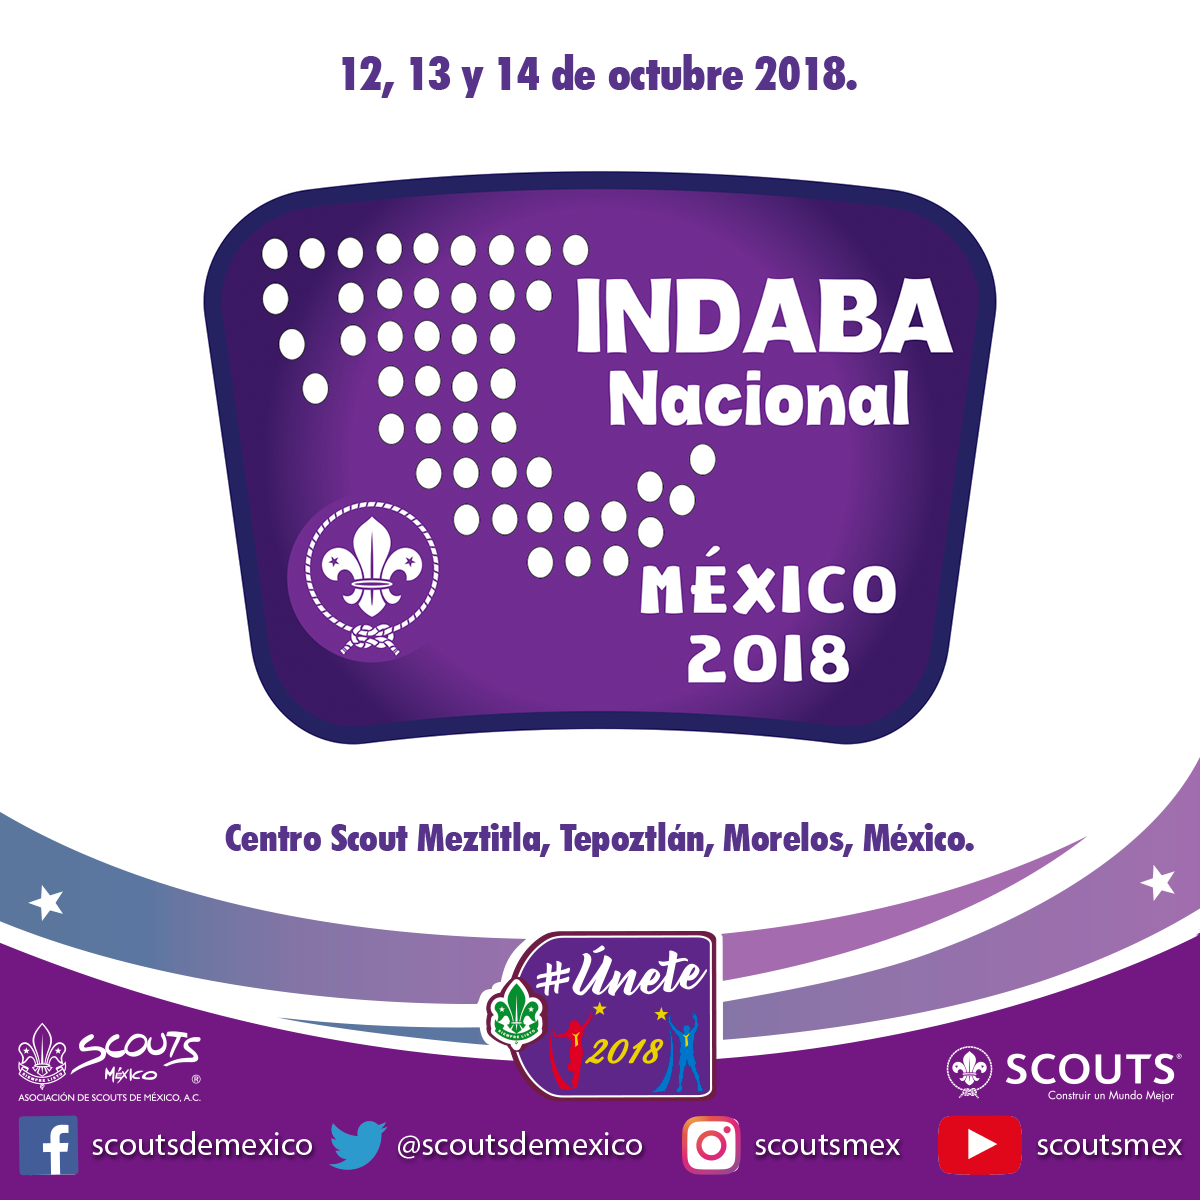 INDABA Nacional 2018